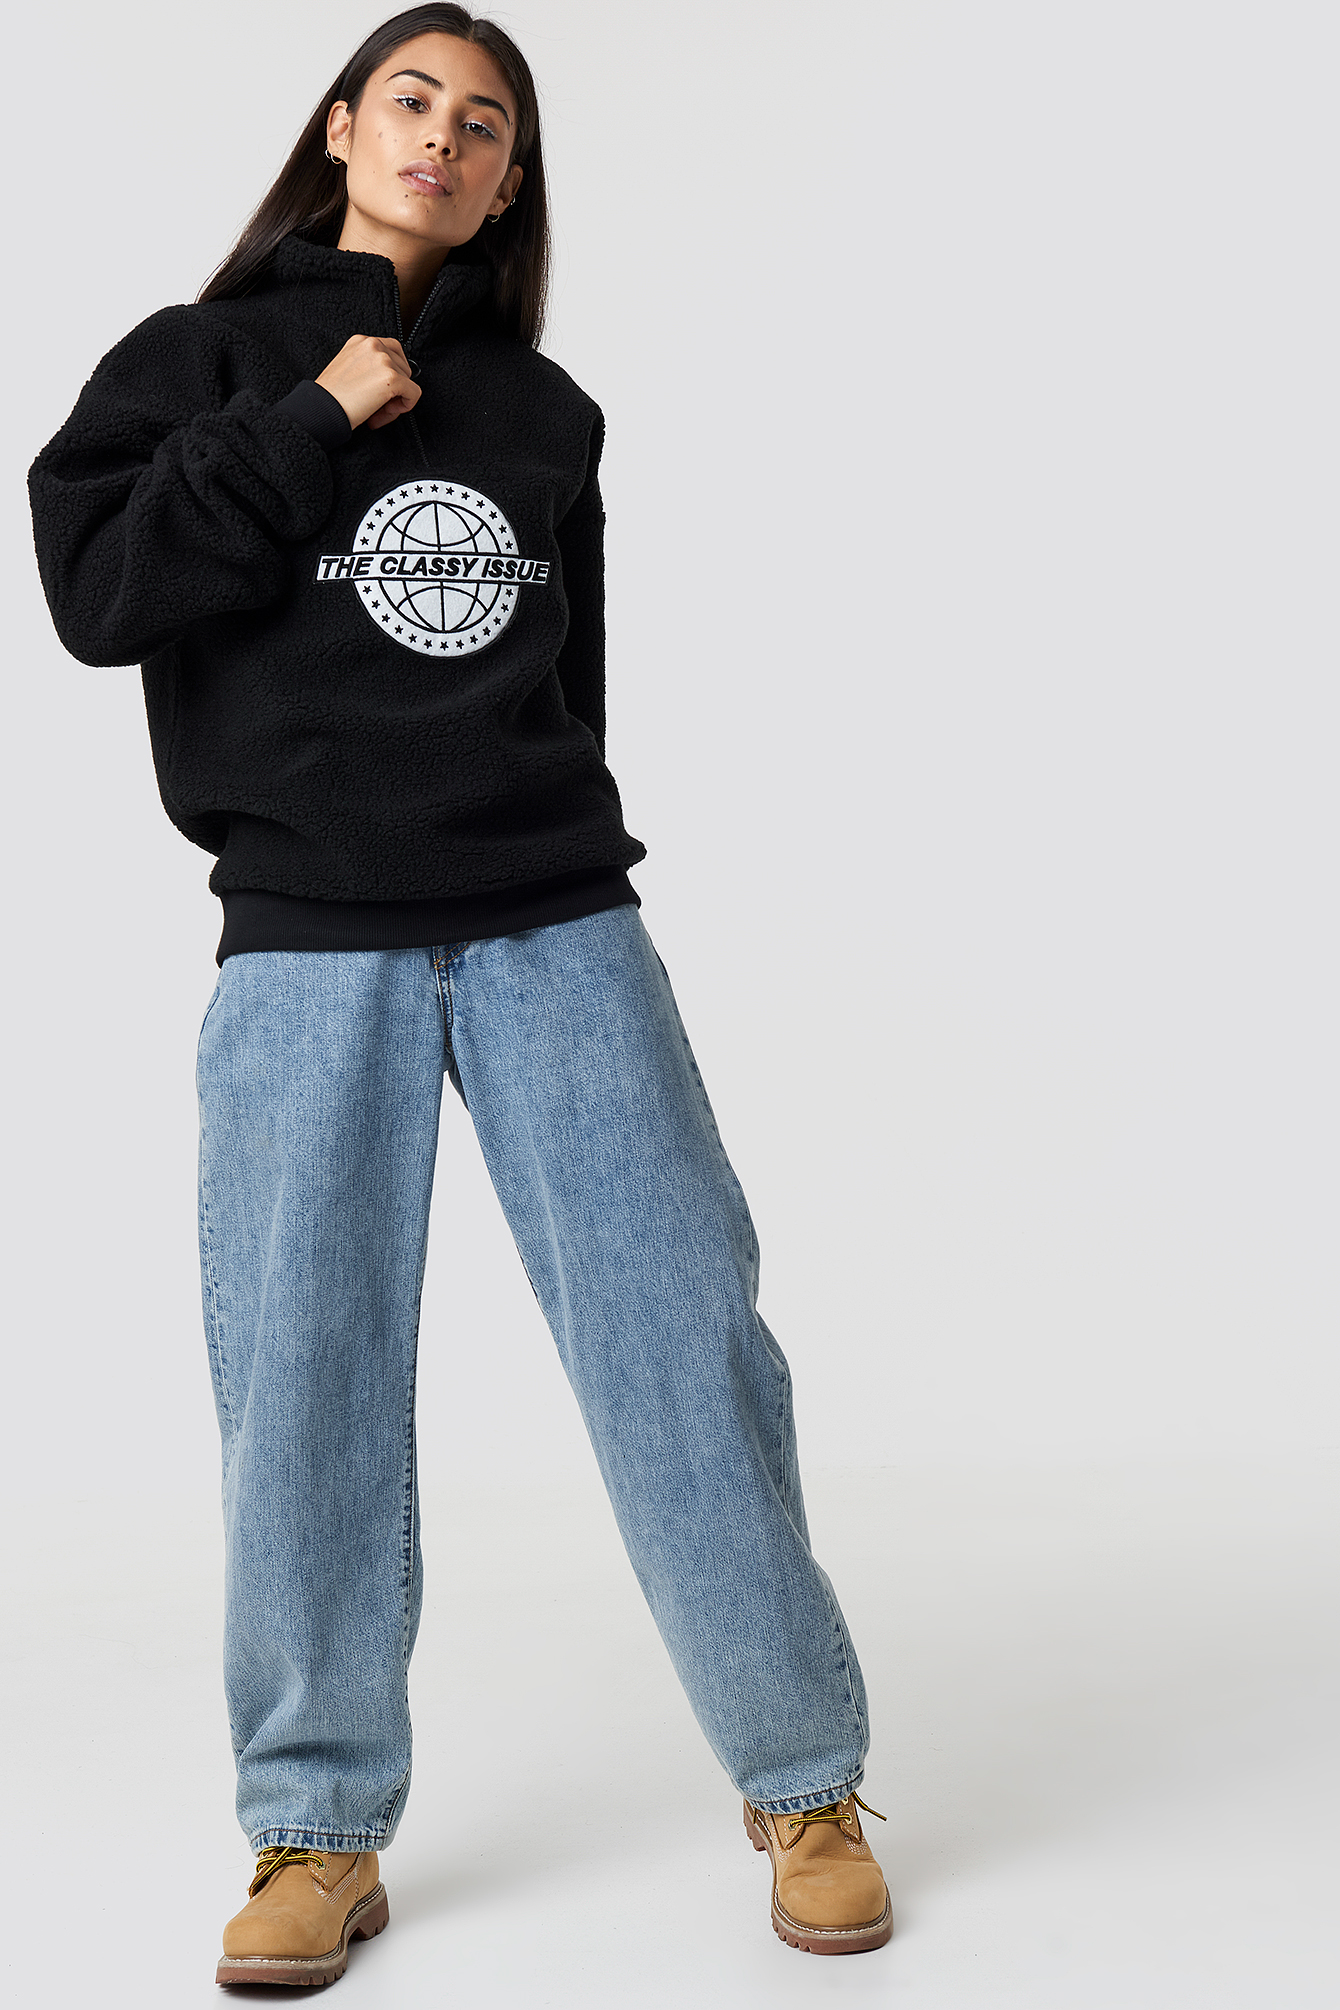 The Classy Polar Unisex Sweatshirt NA-KD.COM